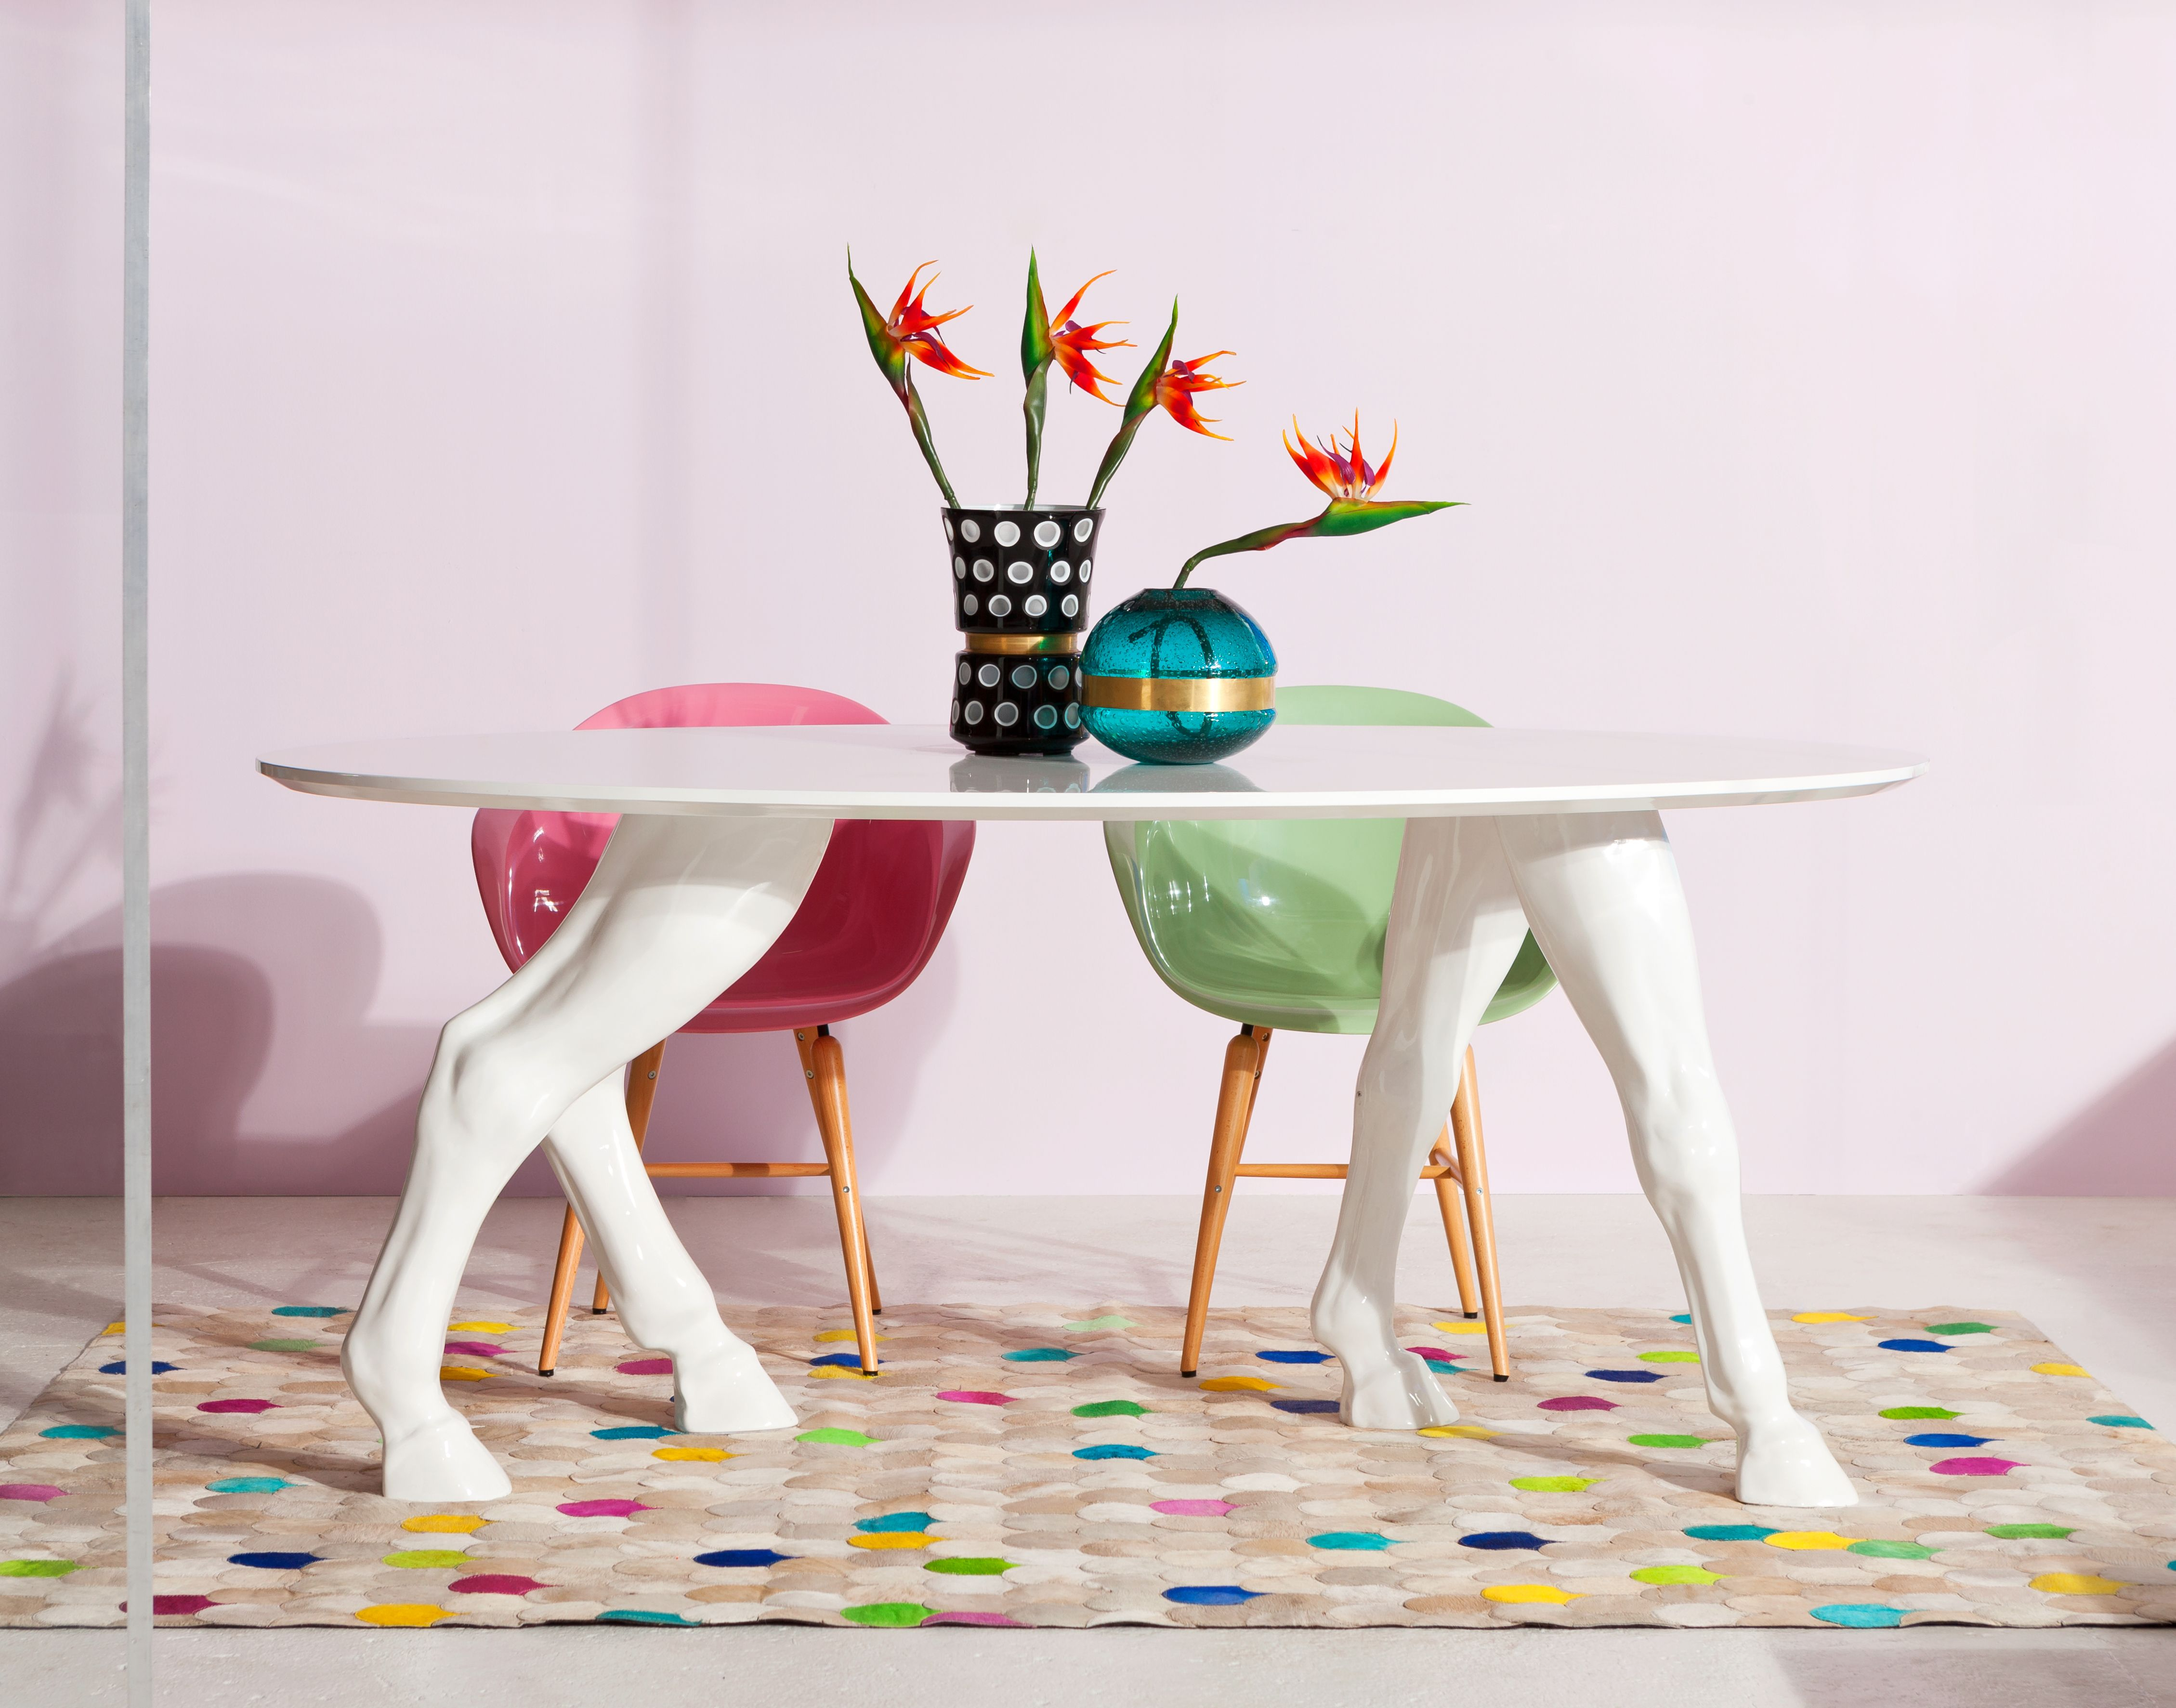 Table Horseshoe White 180x100cm By KARE Design #Table #Horse #Horseshoe # Crazy #Style #Design #White #Dinner #Whitedinner #extraordinary #special  #fun #KARE ...